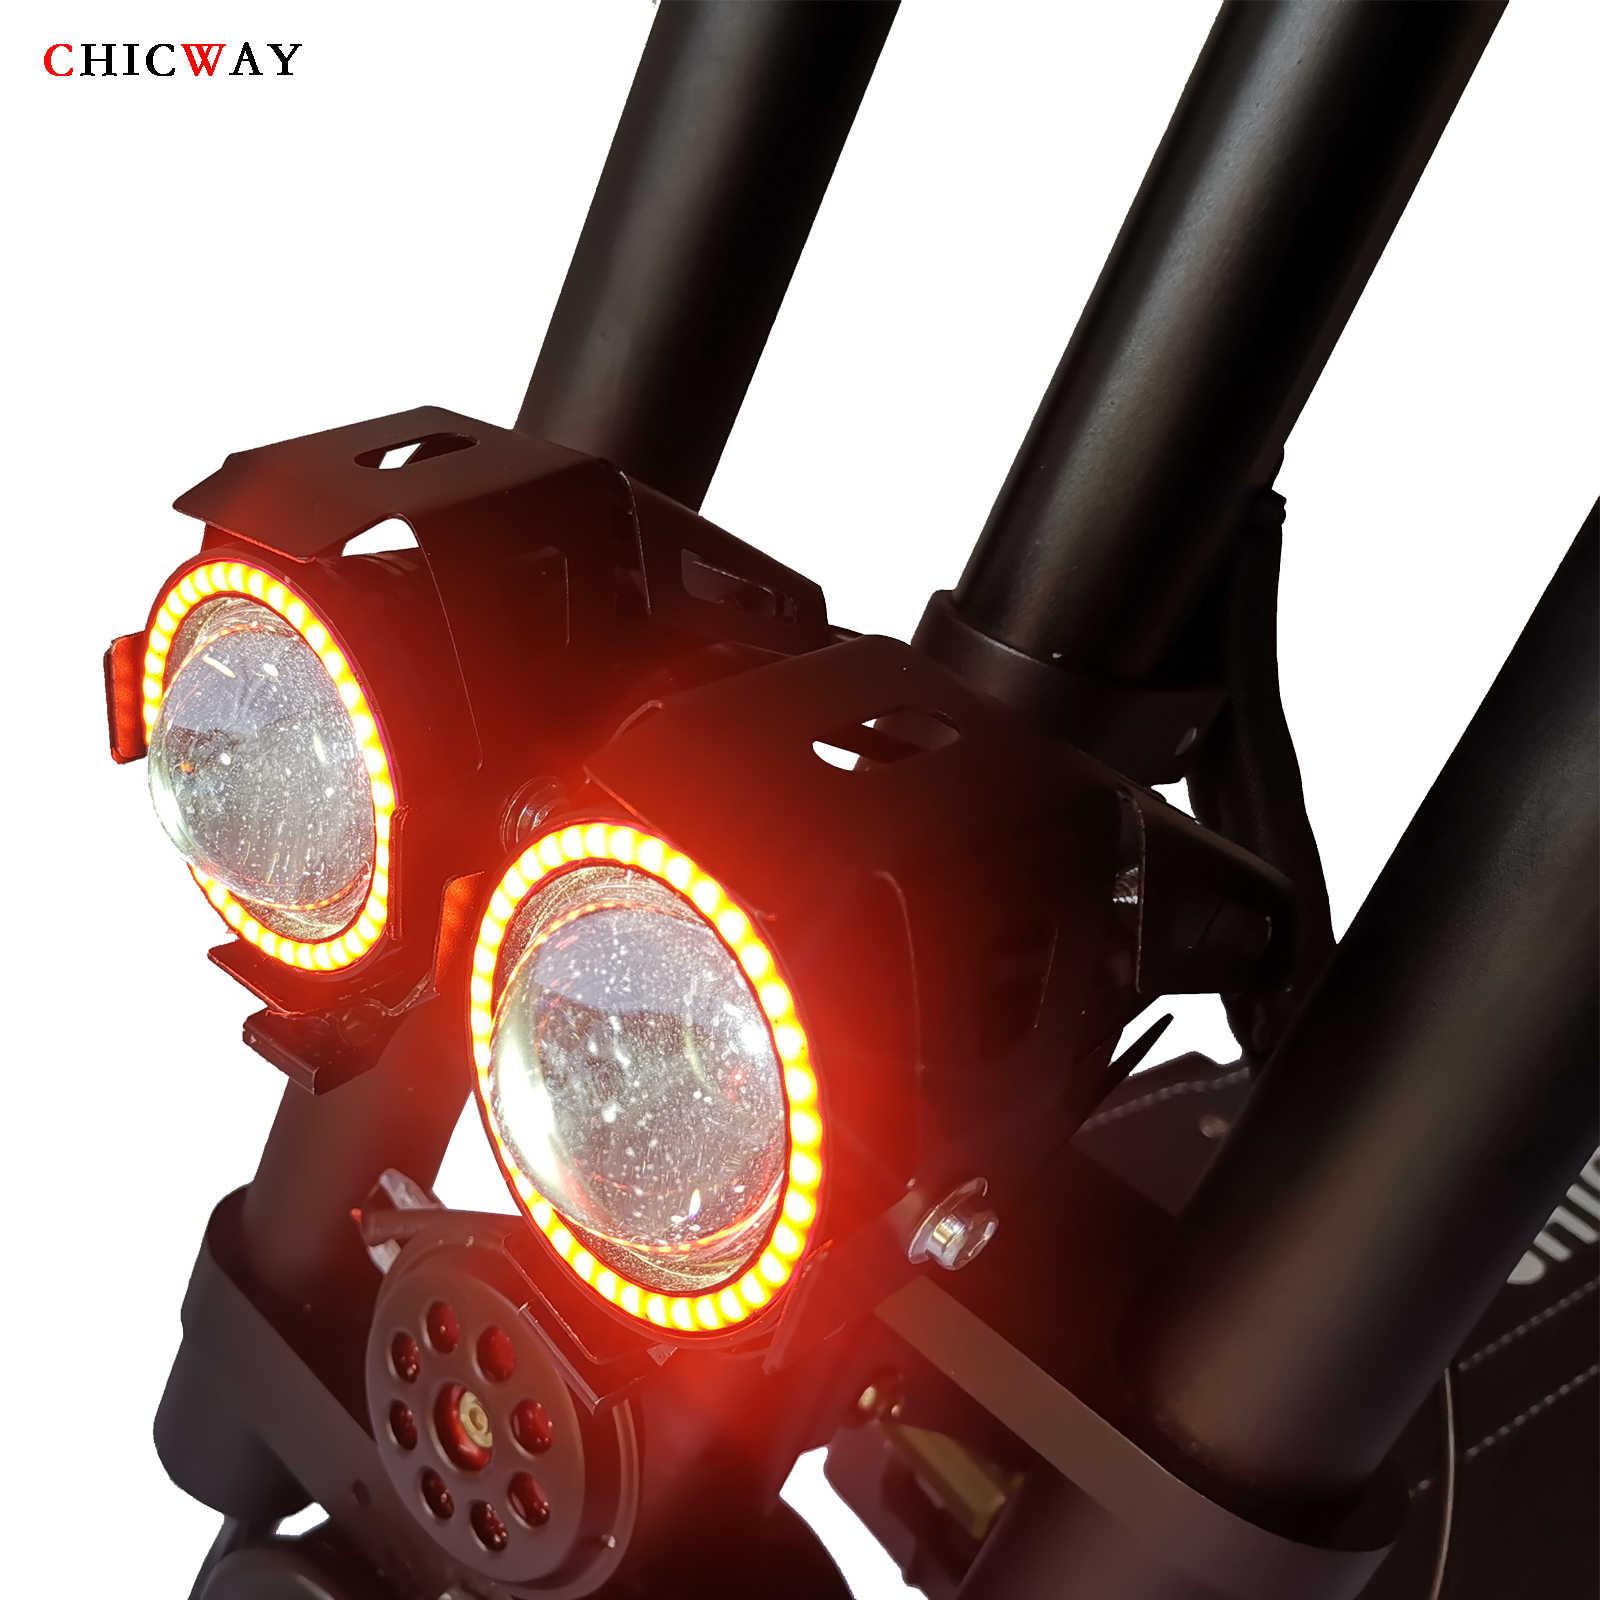 "CHICWAY باتمان محرك مزدوج سكوتر كهربائي 11 ""3200 W المحرك ، سرعة 80 كجم/+ ، تعليق مستقل ، ممتص الصدمات الهيدروليكي ، 35AH"